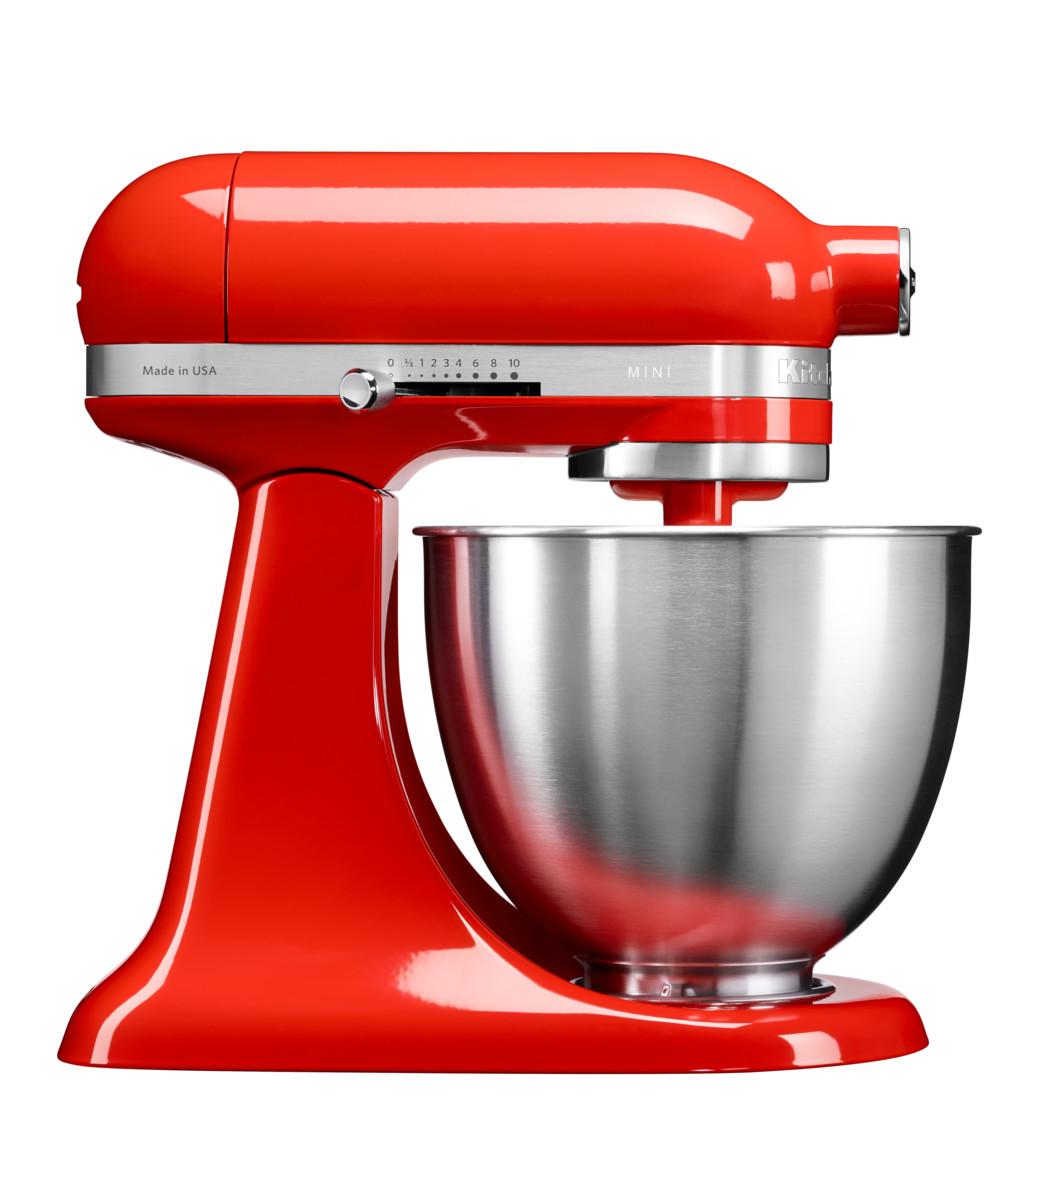 KITCHEN A 3.3L迷你廚師機 5KSM3311XBHT 紅色